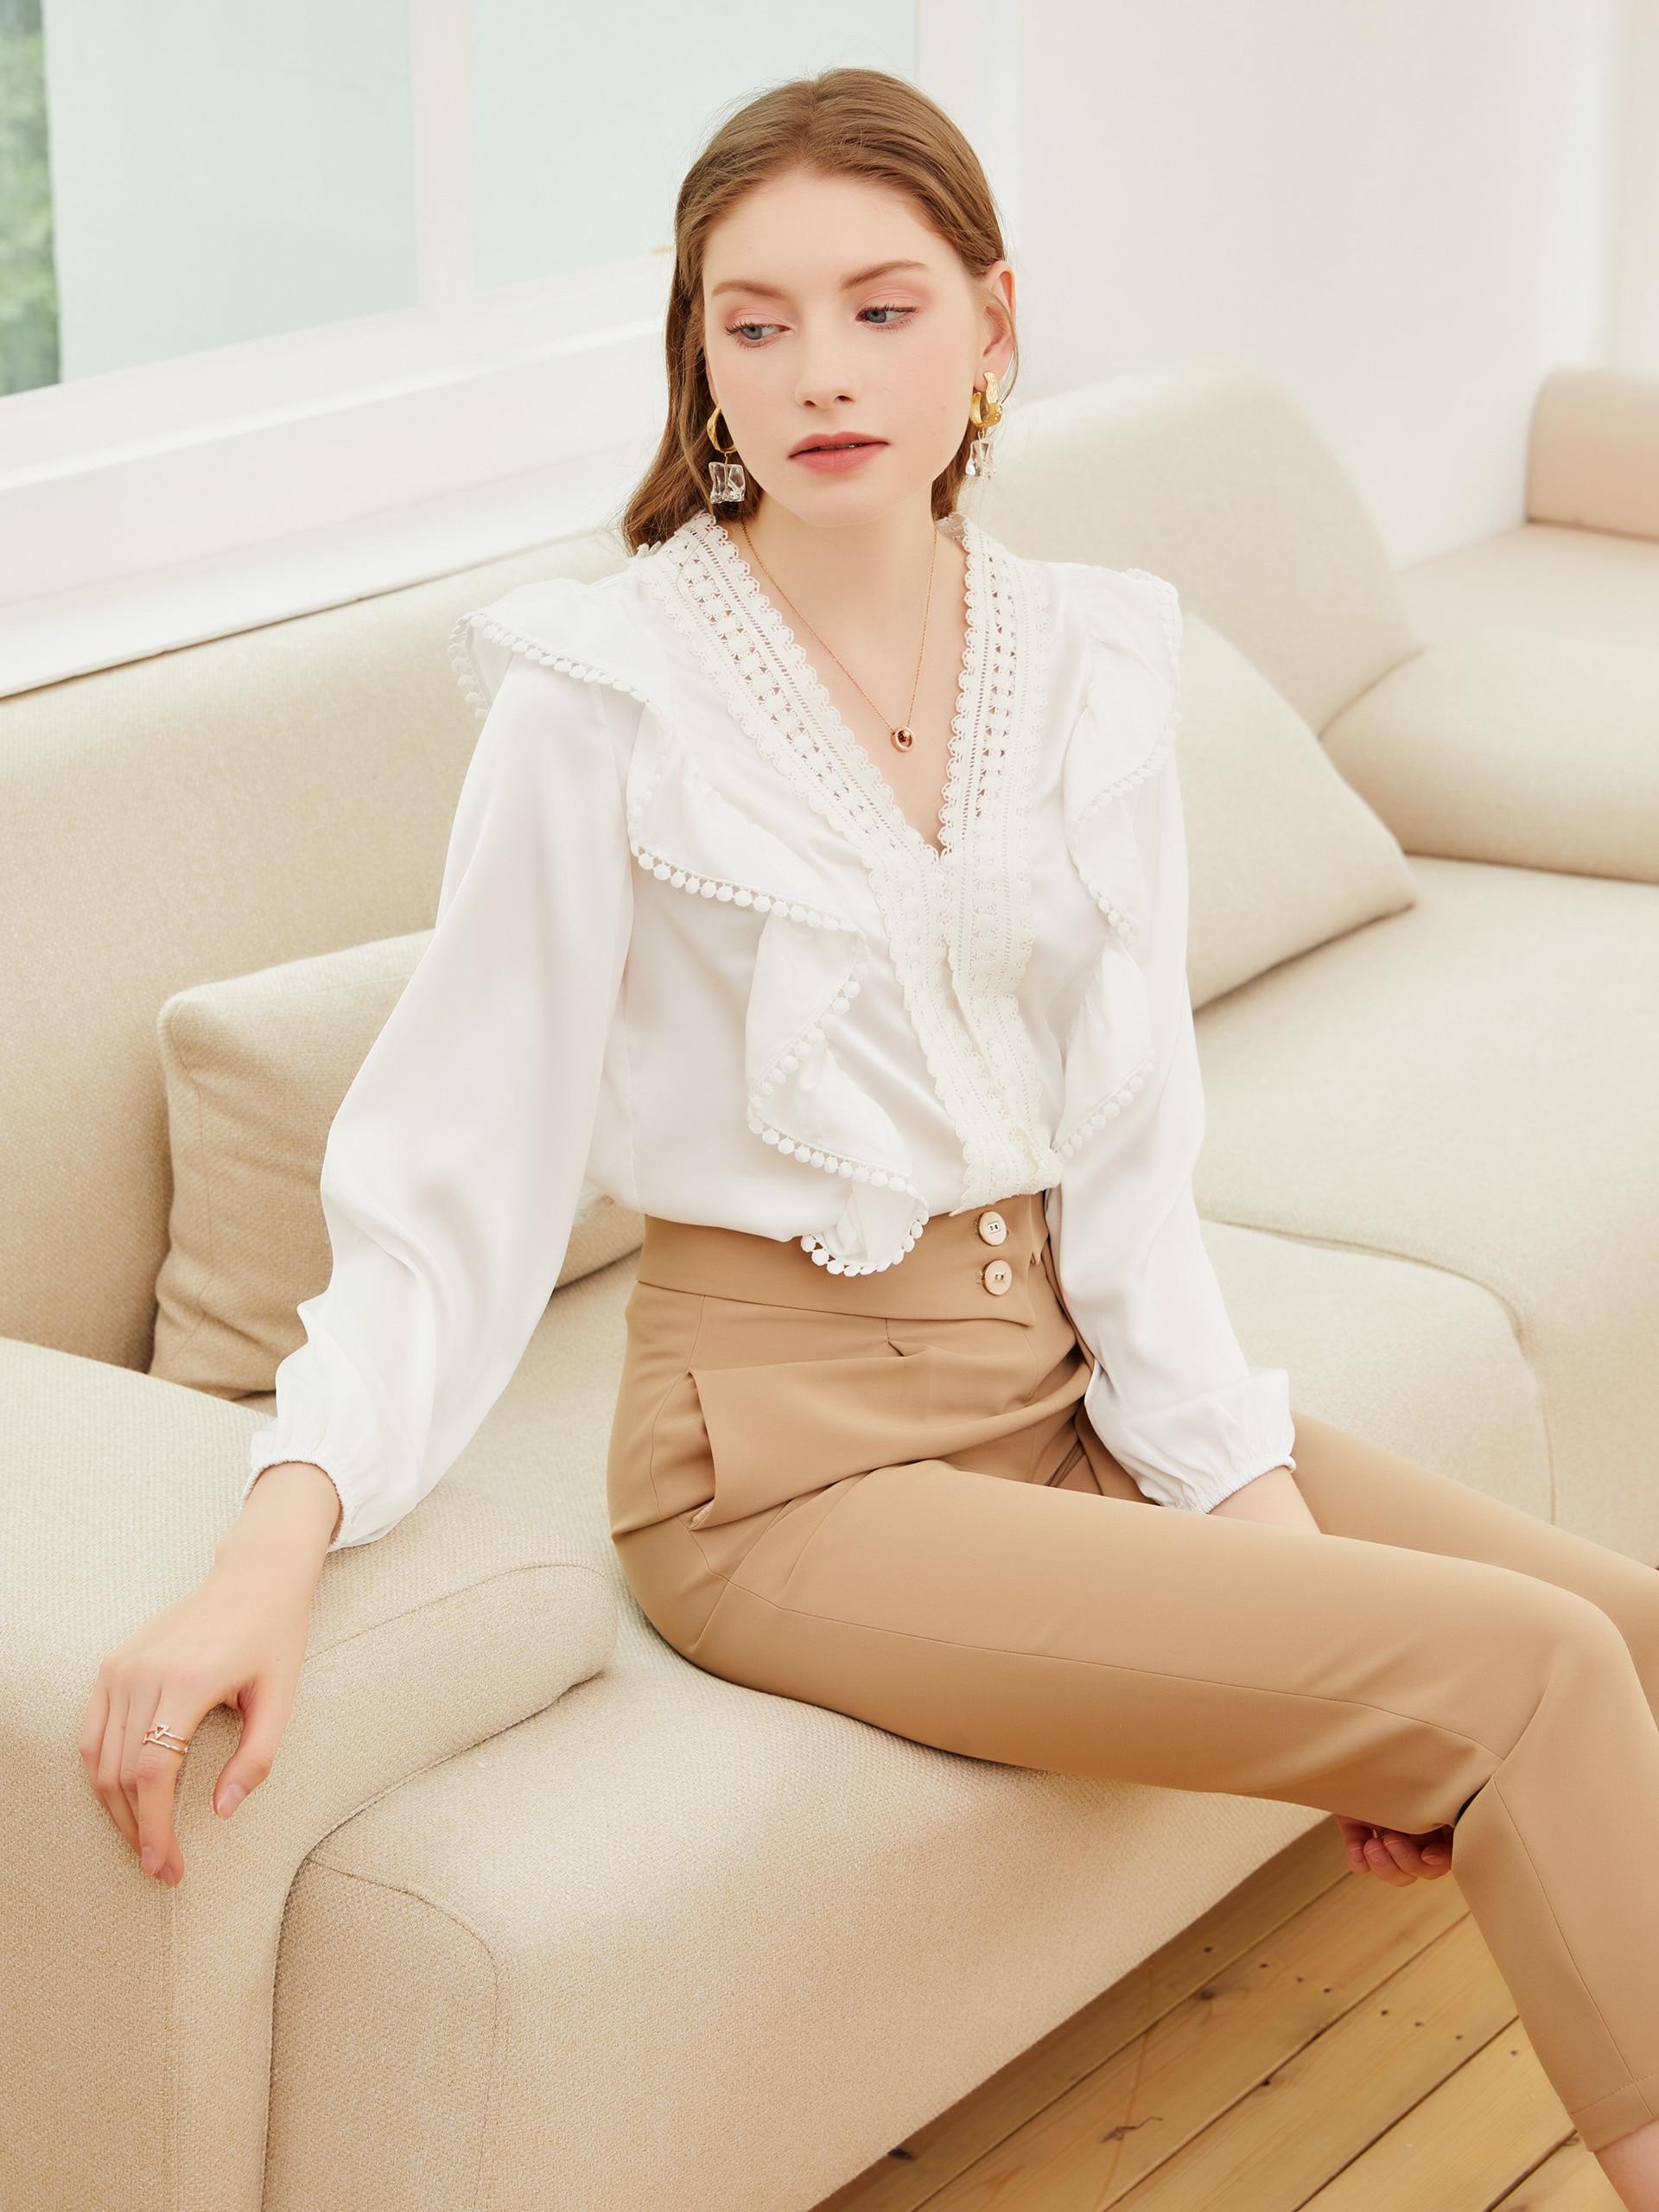 2021 spring and summer new style shirt personality splicing chiffon shirt fashion Ruffle water solub